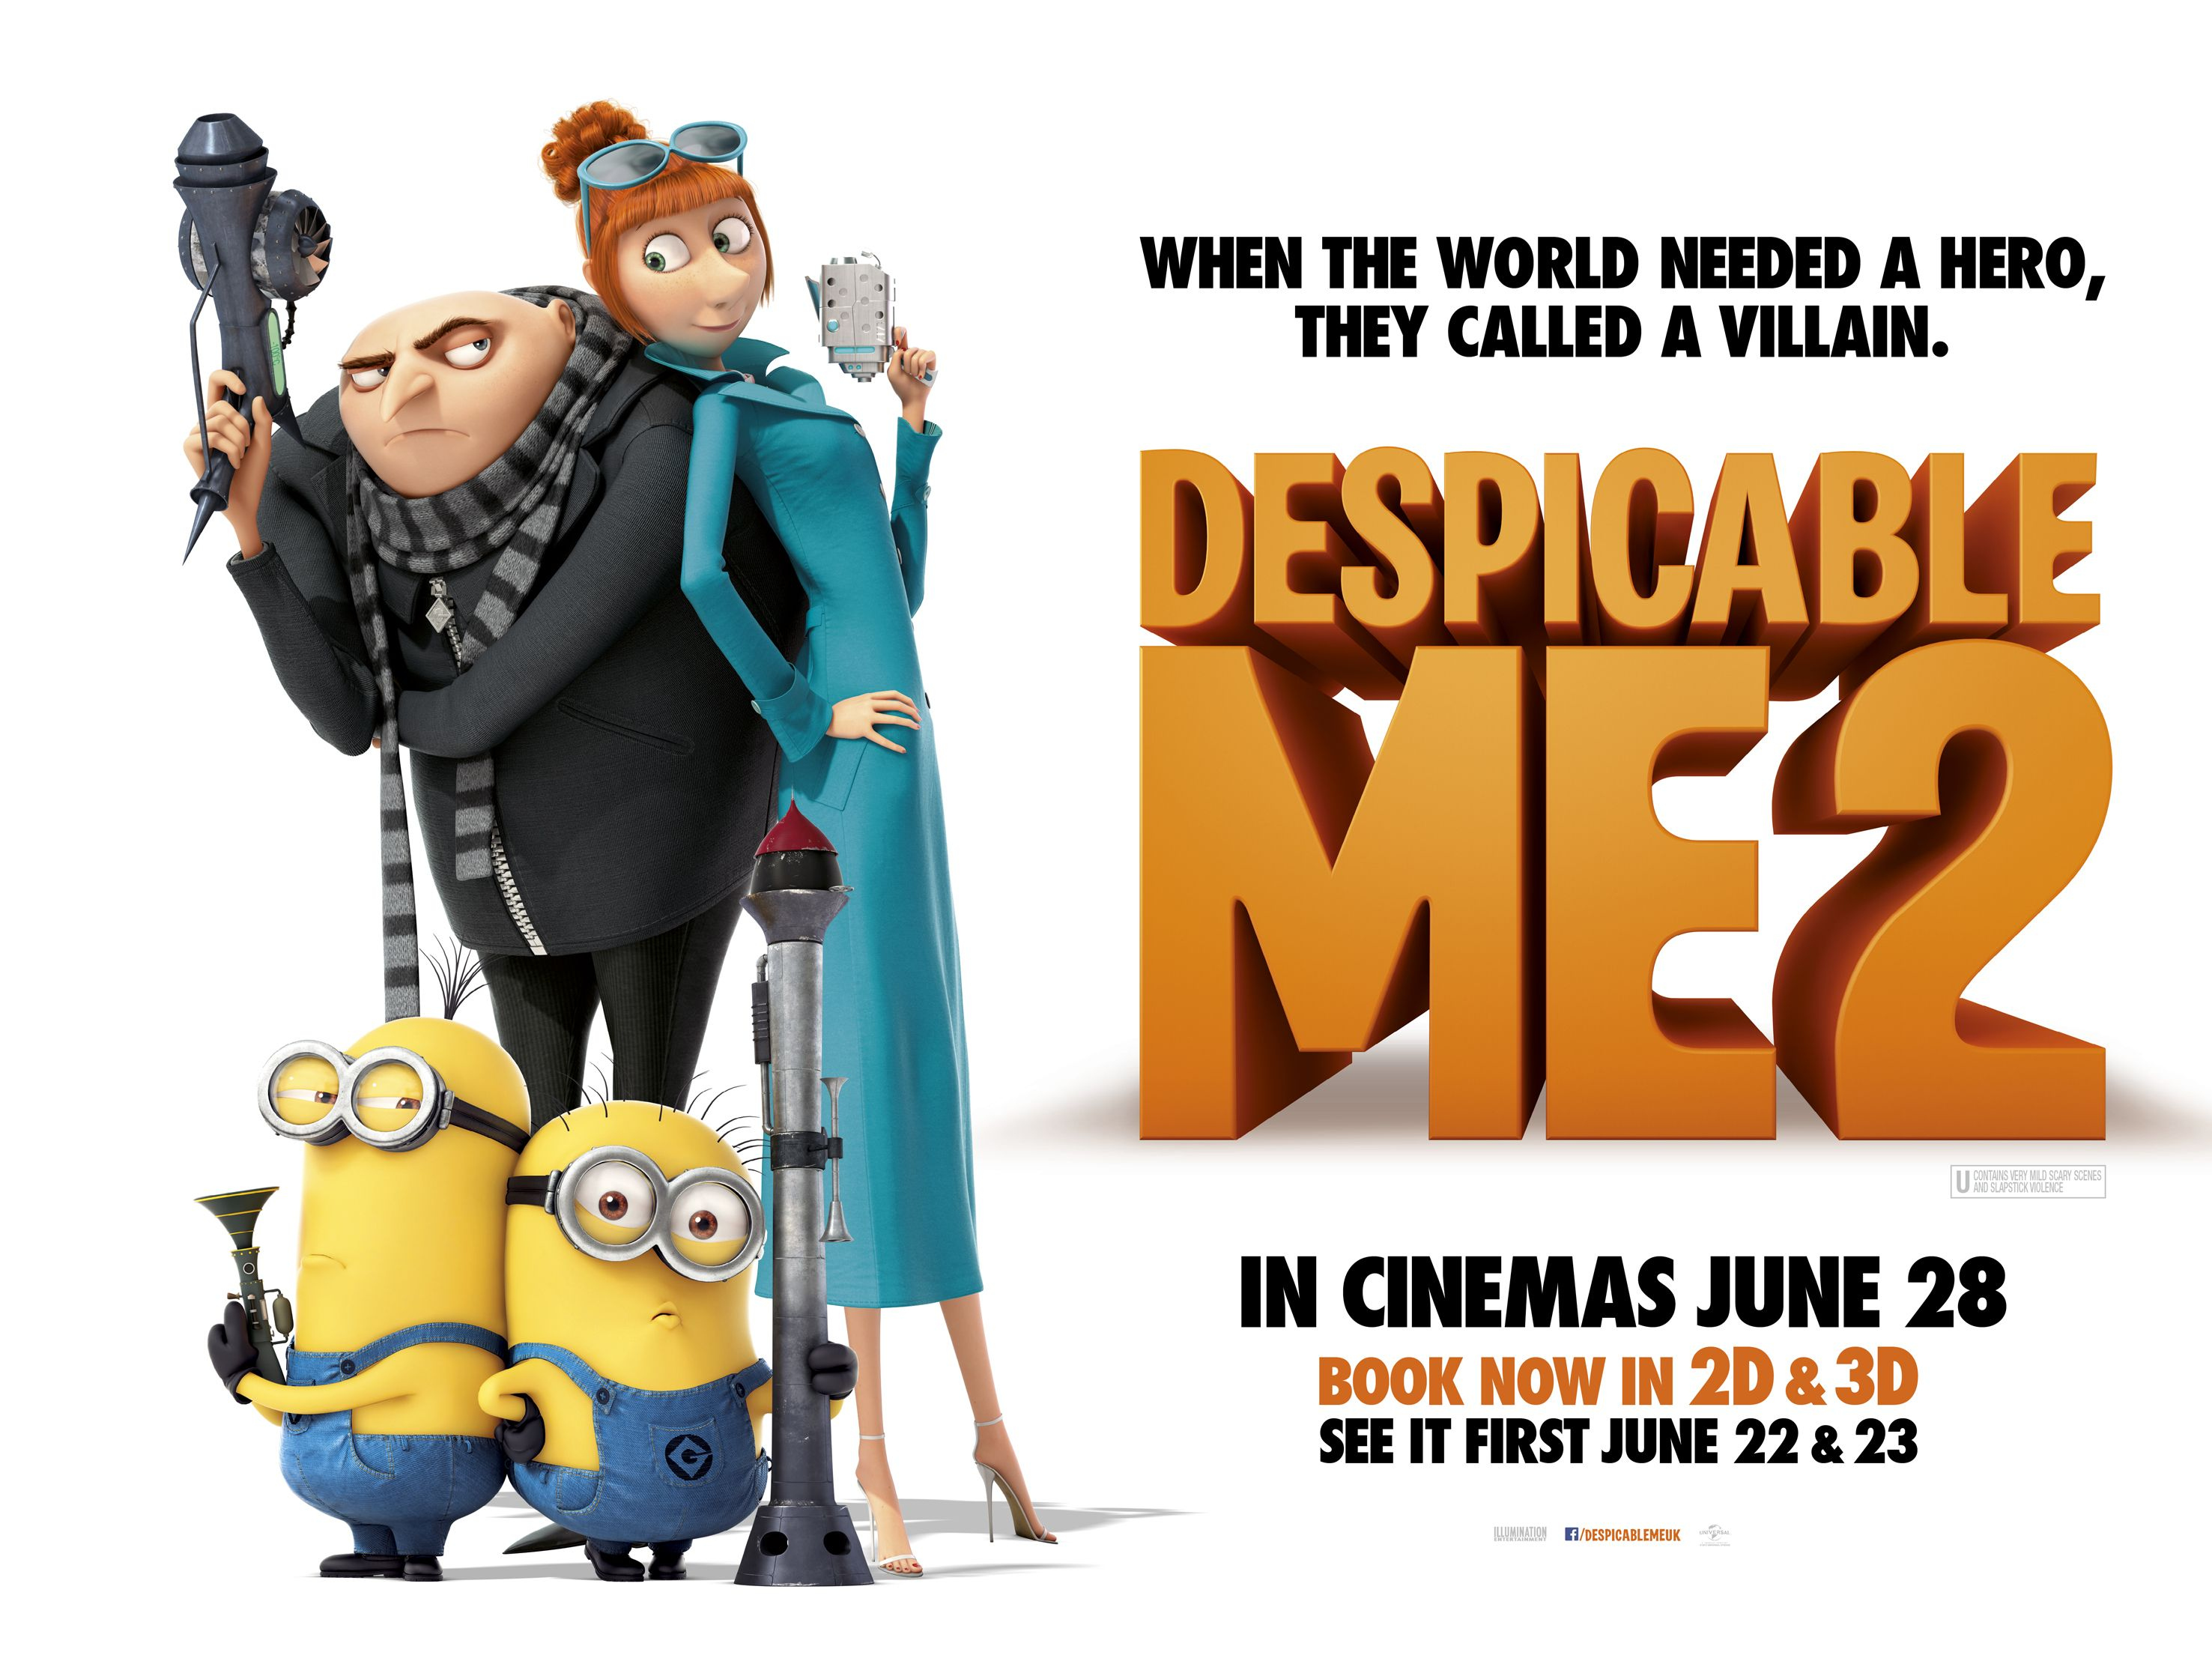 Despicable Me 2 (2013) ★★